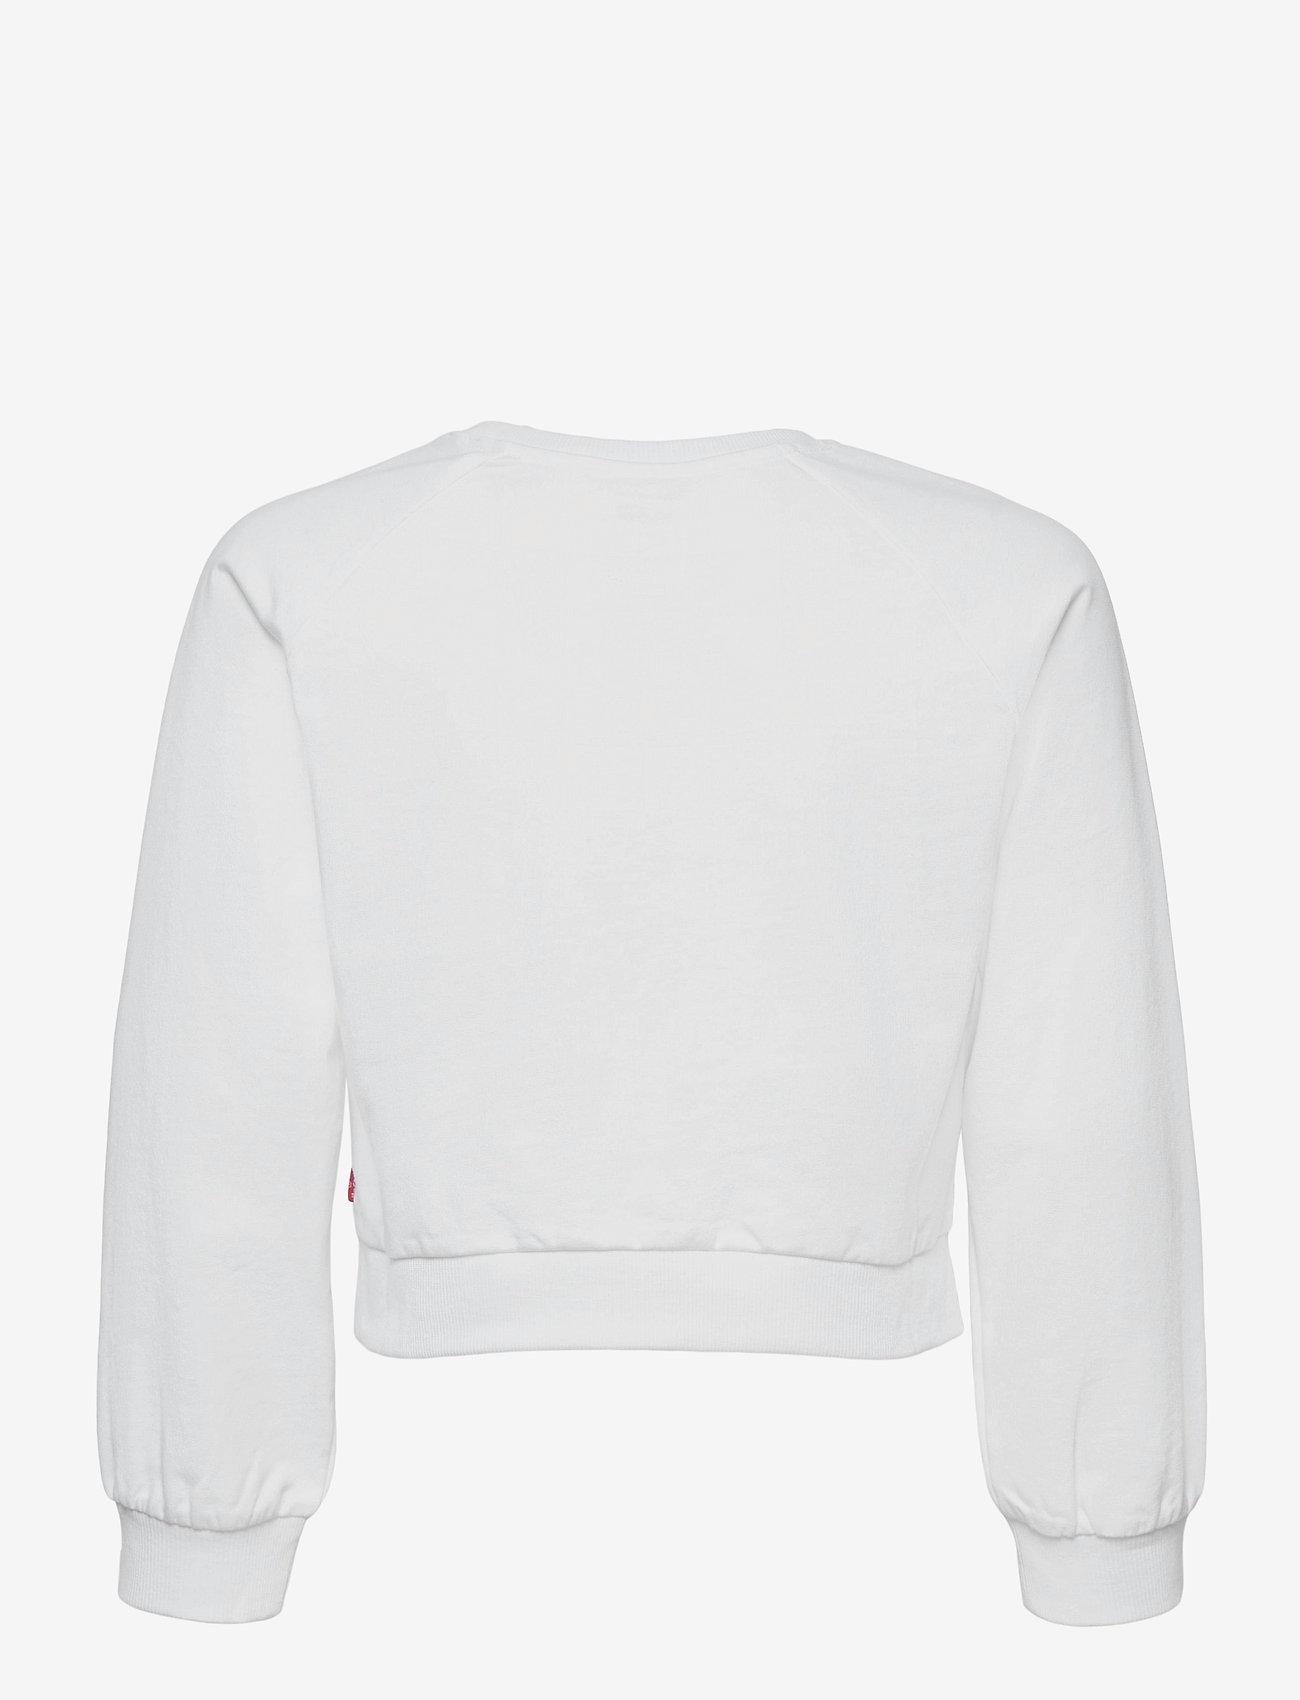 Levi's - LVG HIGH RISE RAGLAN CREW - sweatshirts - white - 1